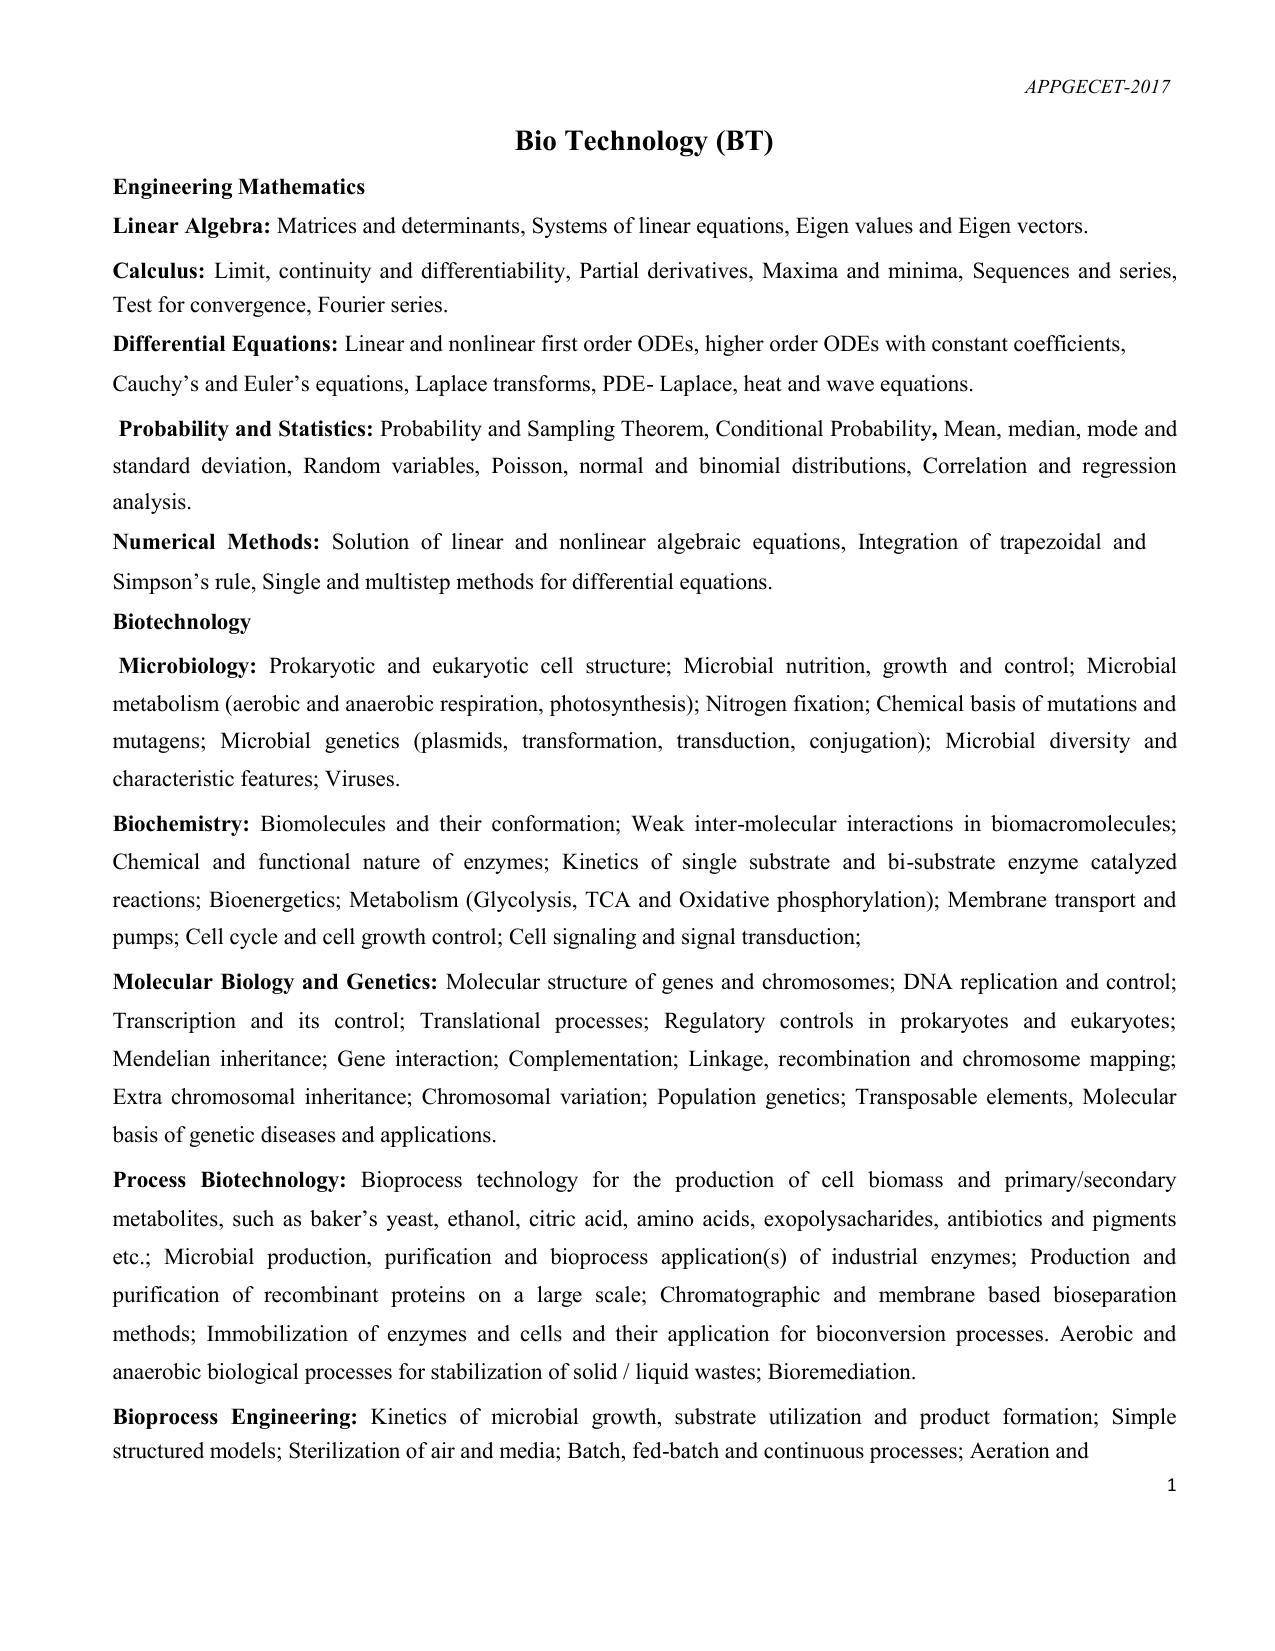 Bio Technology - Sche.ap.gov.in on gene drawing, gene testing, gene editing, gene concept map, gene technology, gene science, gene biology, gene identification, gene cloning, gene linkage,